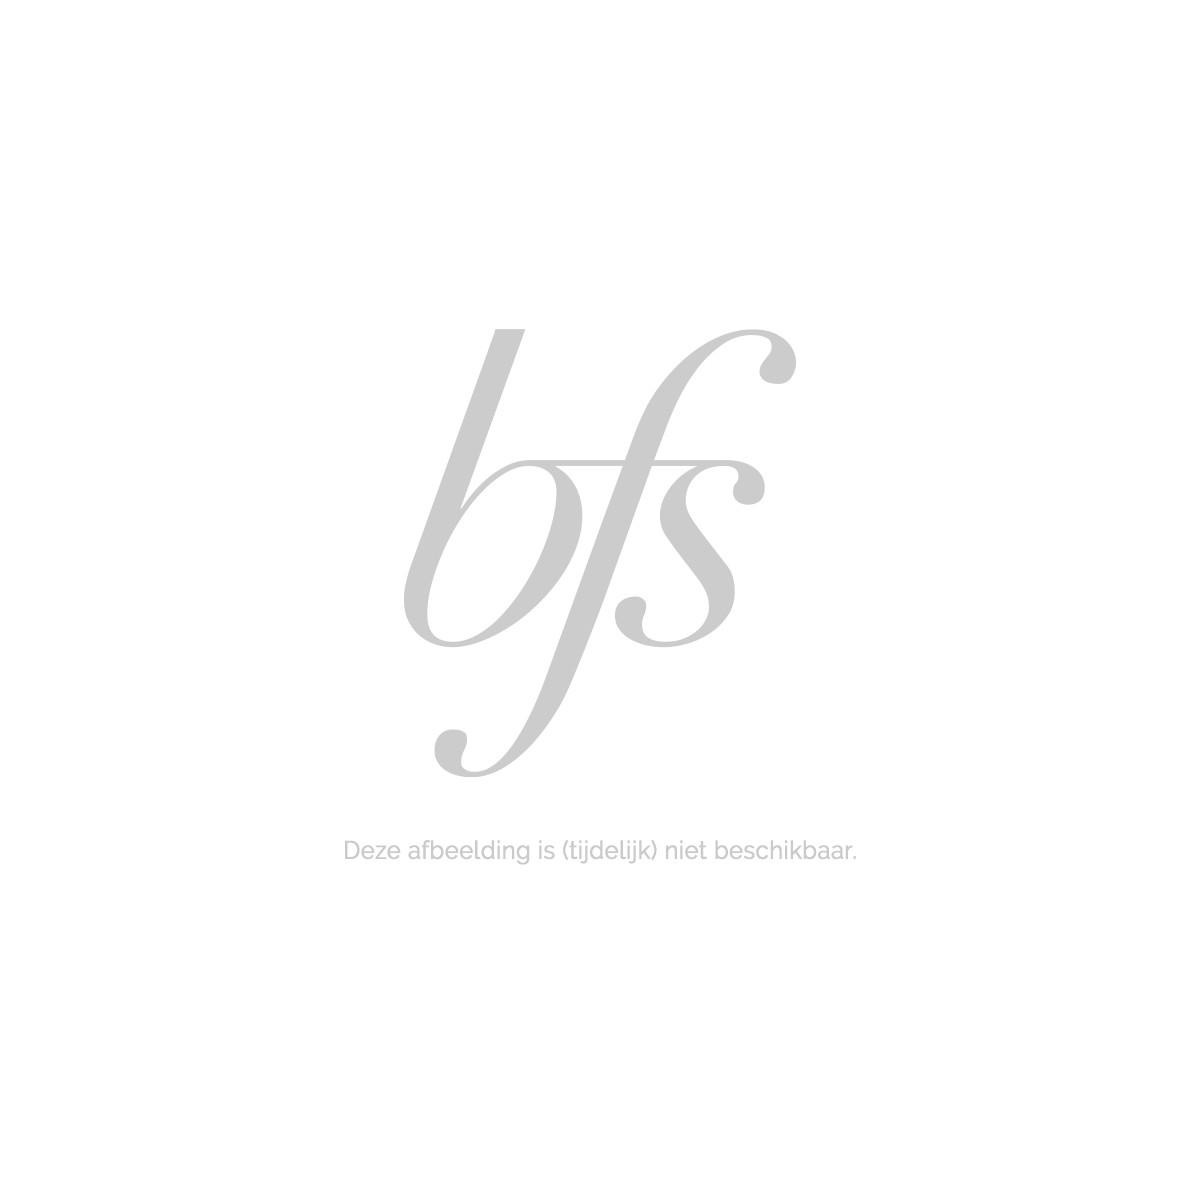 Elizabeth Arden Skin Balancing Lotion Spf 15 Oil-Free